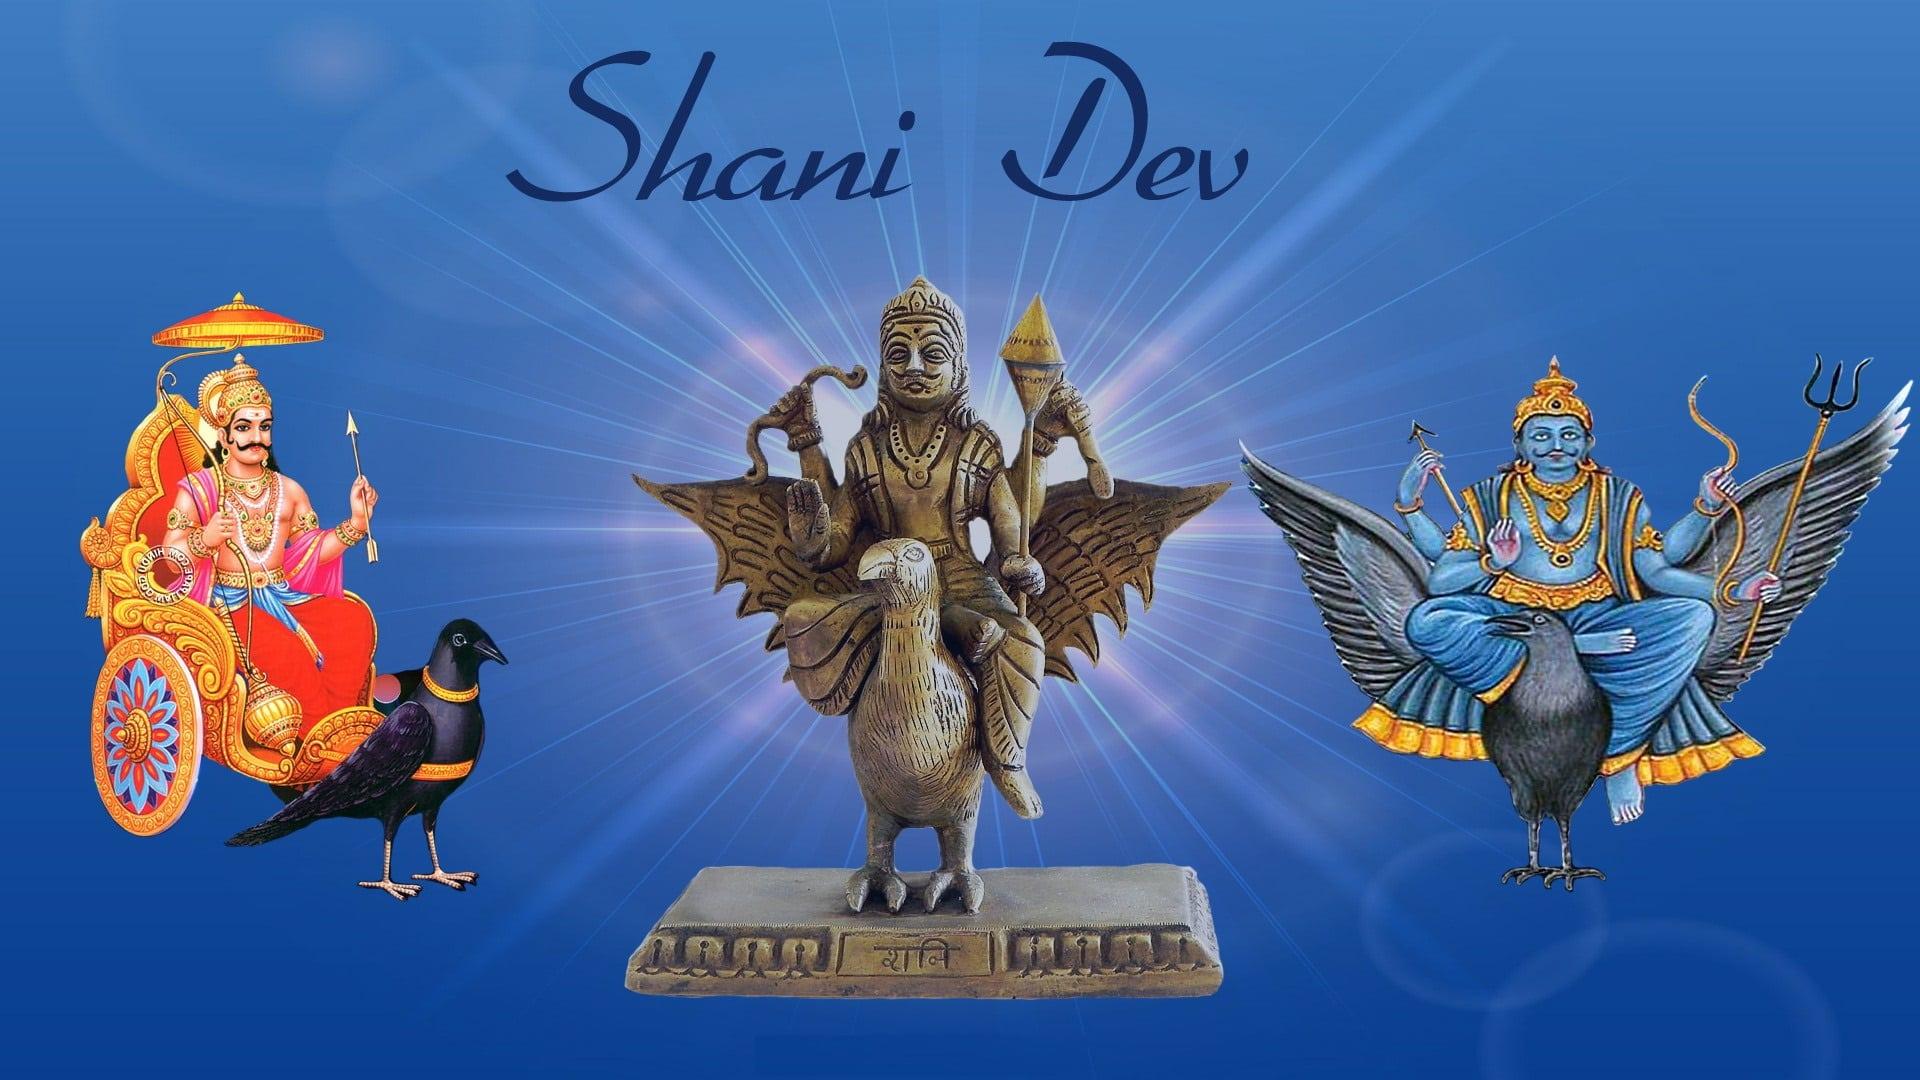 Lord Shiva Black Hd Wallpapers Lord Shani Dev Wallpapers Wordzz